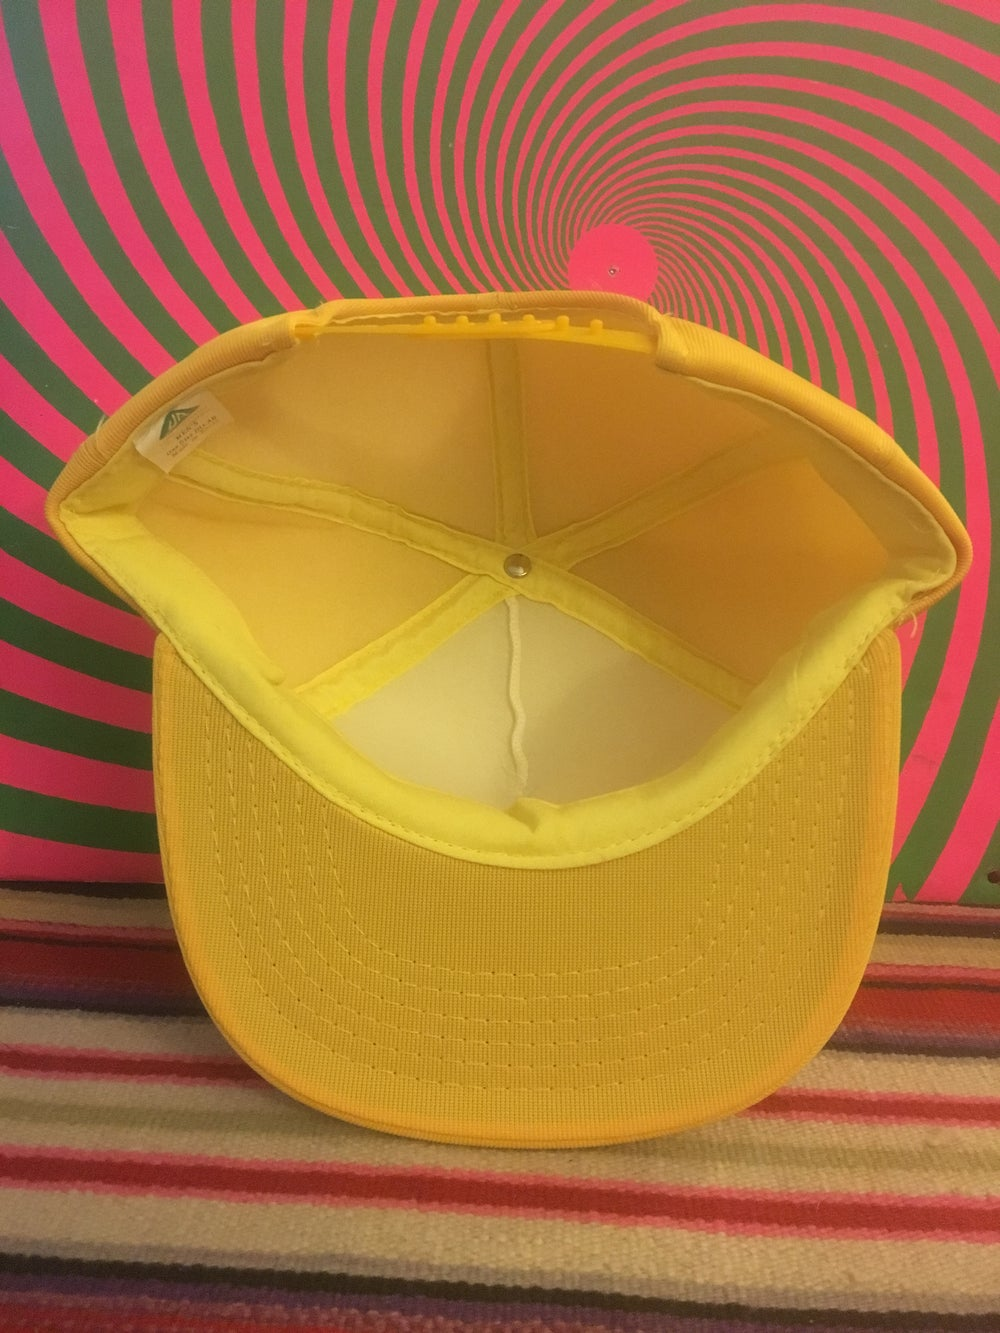 Image of yellow/white trucker hat w/ hella bat